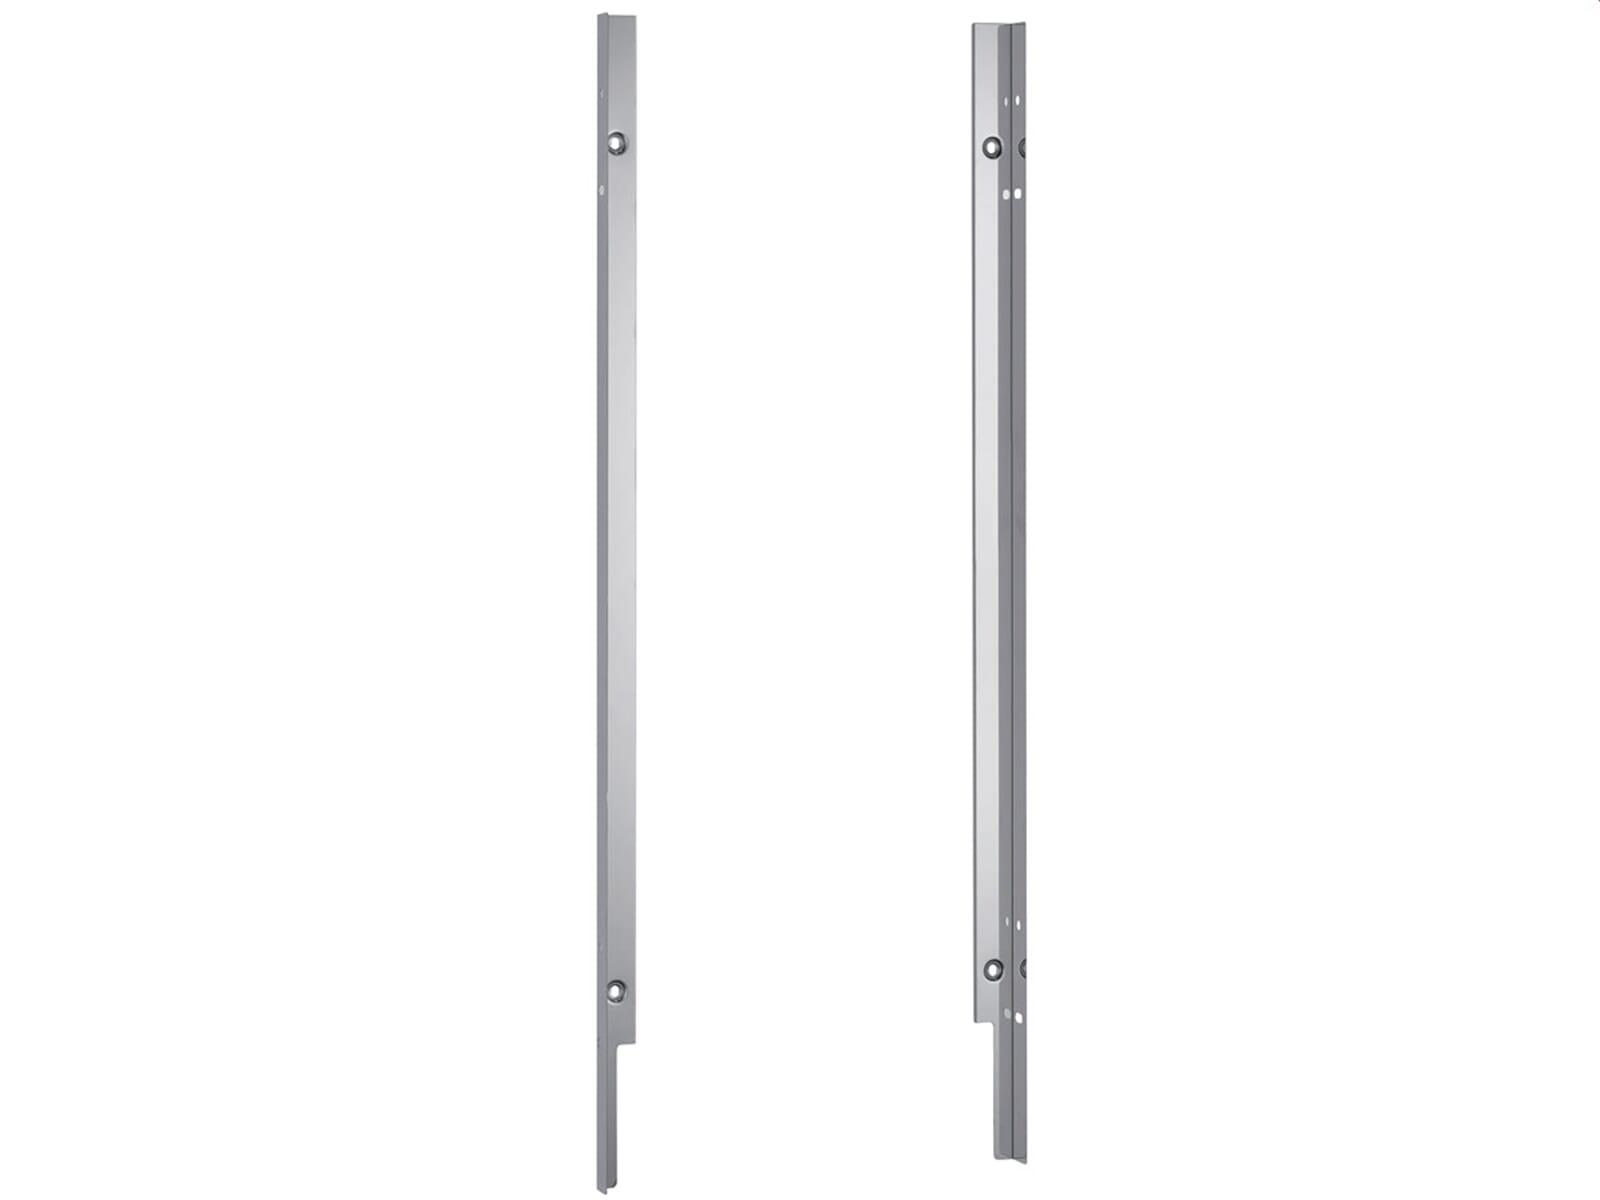 Gaggenau DA 020 110 Verblendungsleisten 86,5 cm Edelstahl